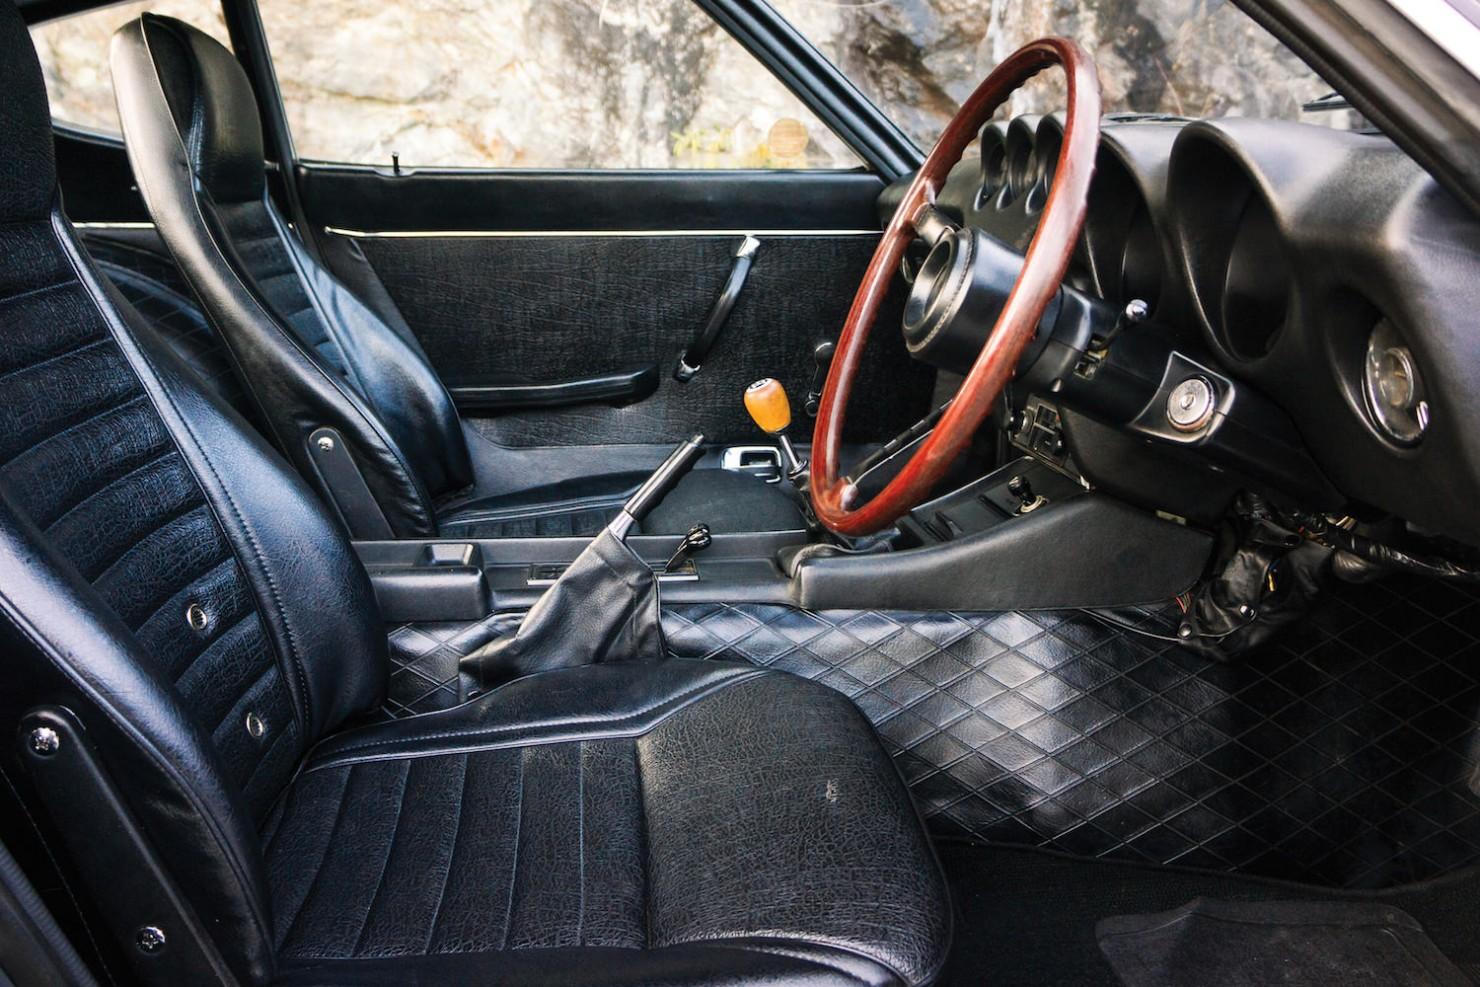 Nissan-Fairlady-Z-432-4